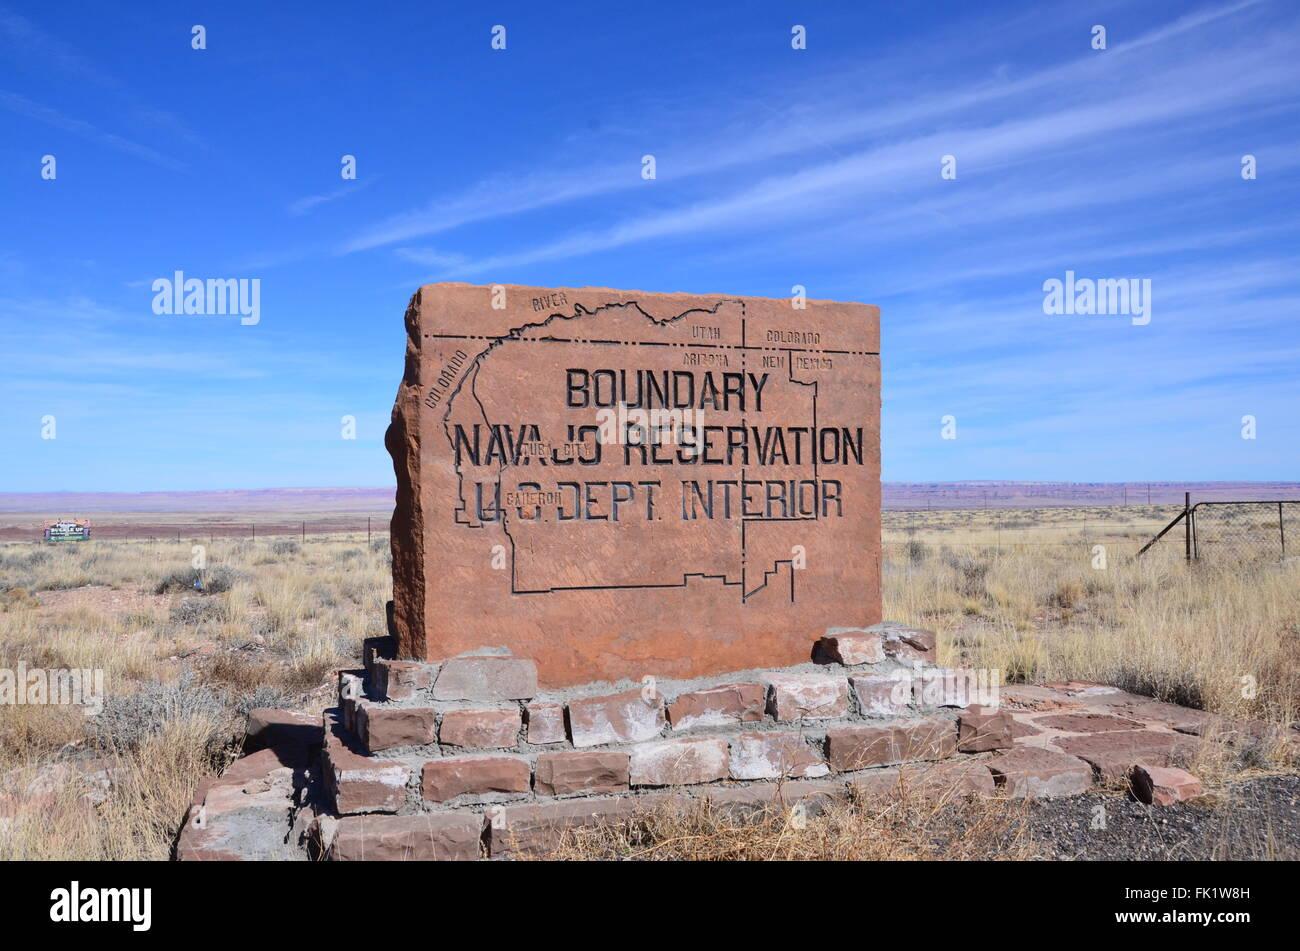 navajo reservation boundary sign arizona blue sky sunny day - Stock Image